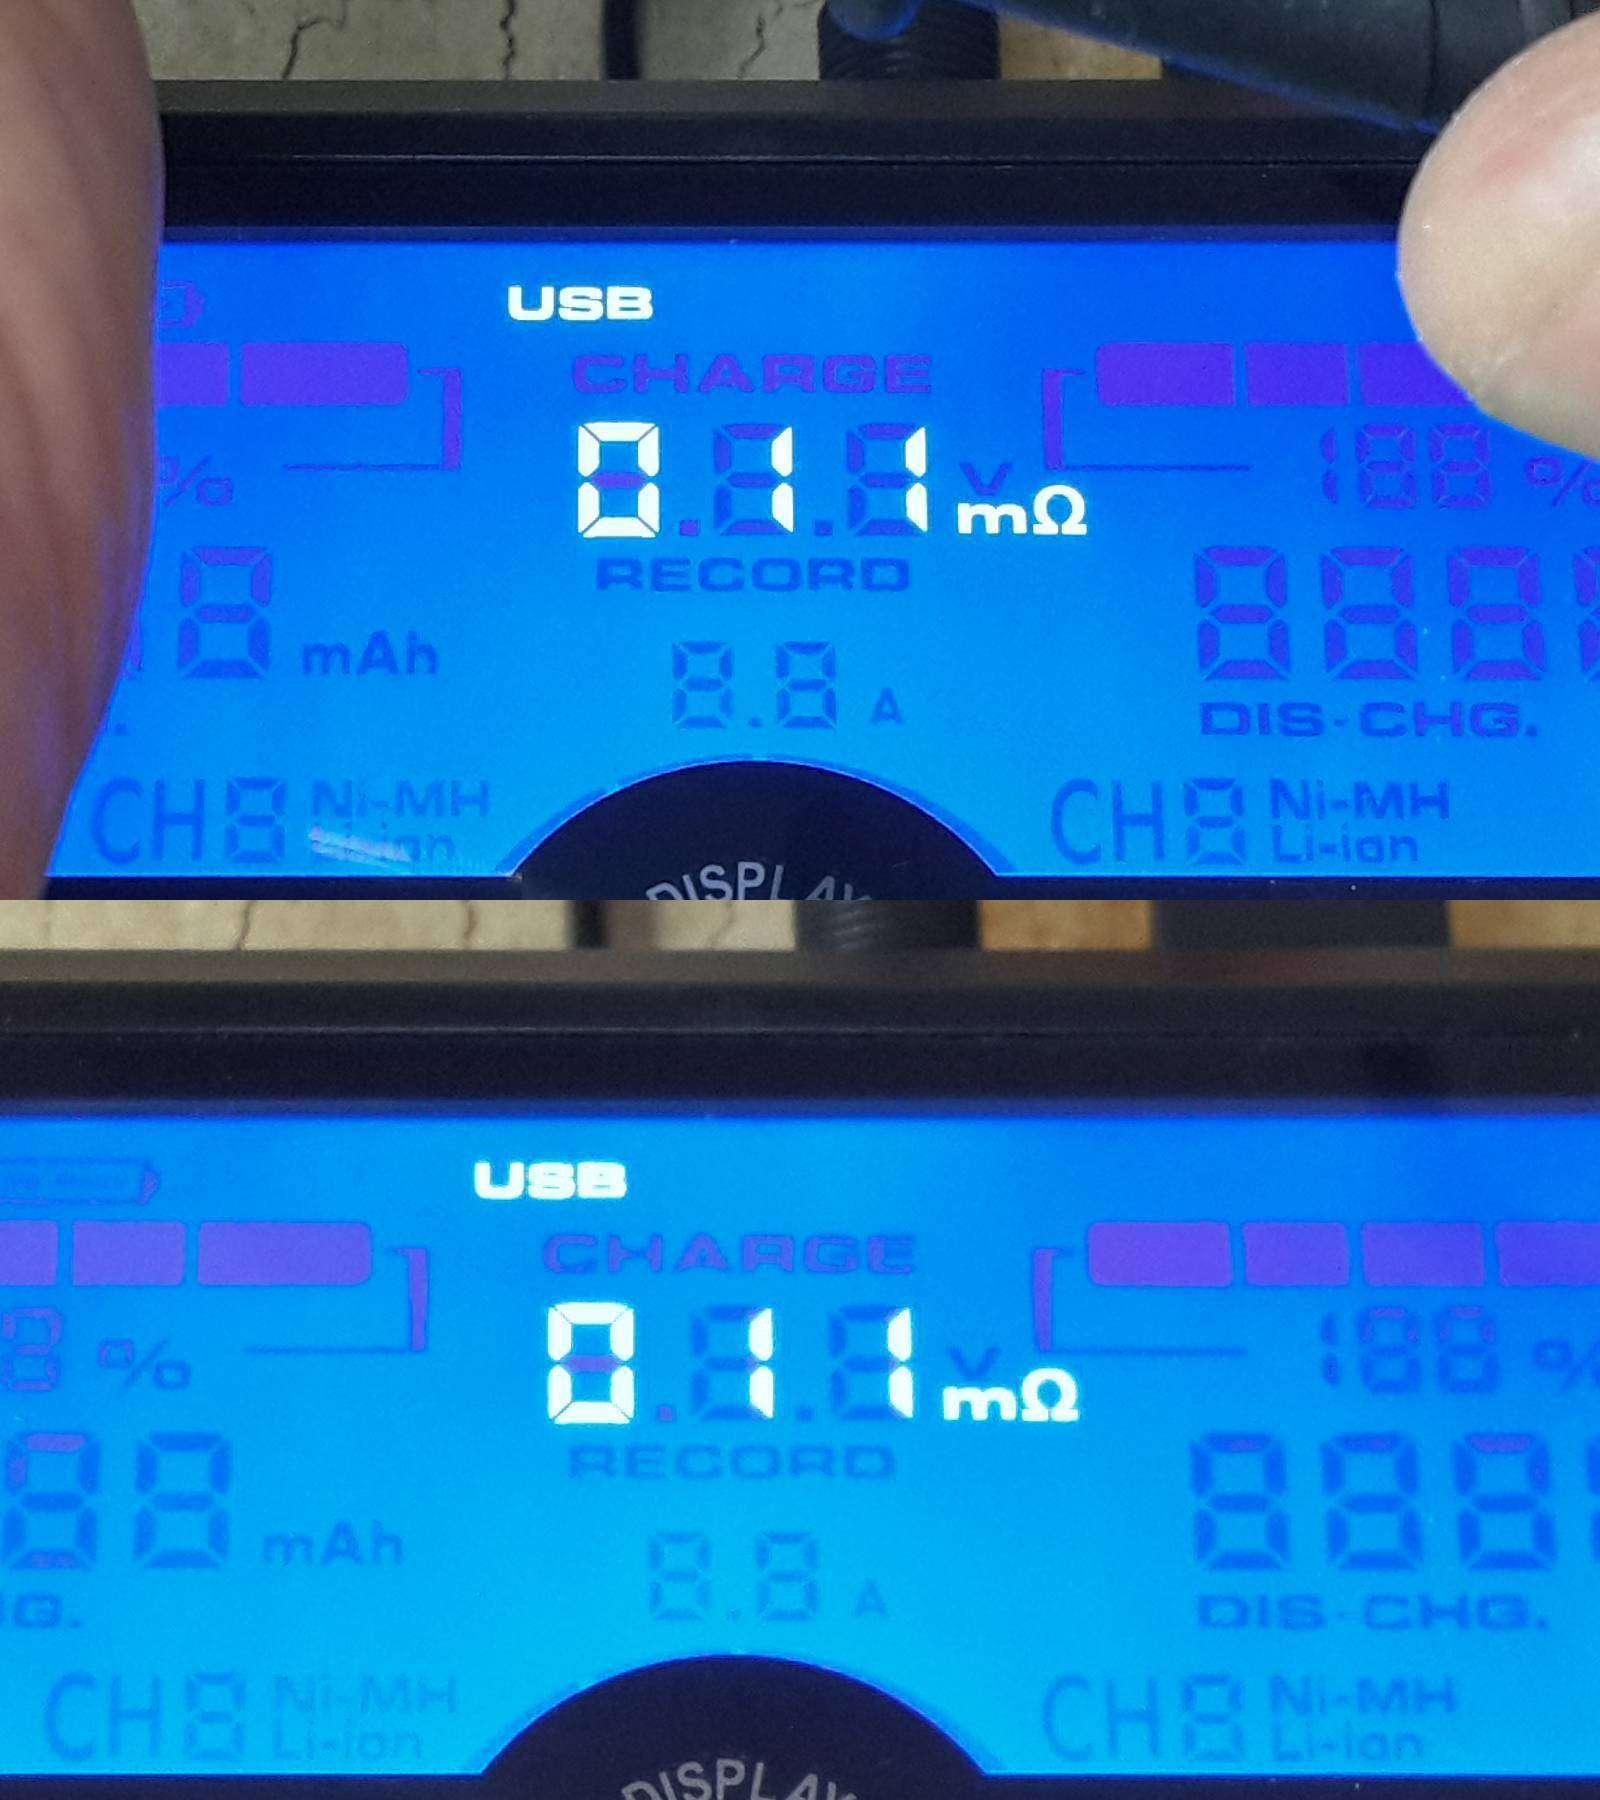 GearBest: Sony VTC6 - обзор и тестирование 18650 аккумуляторов US18650VTC6